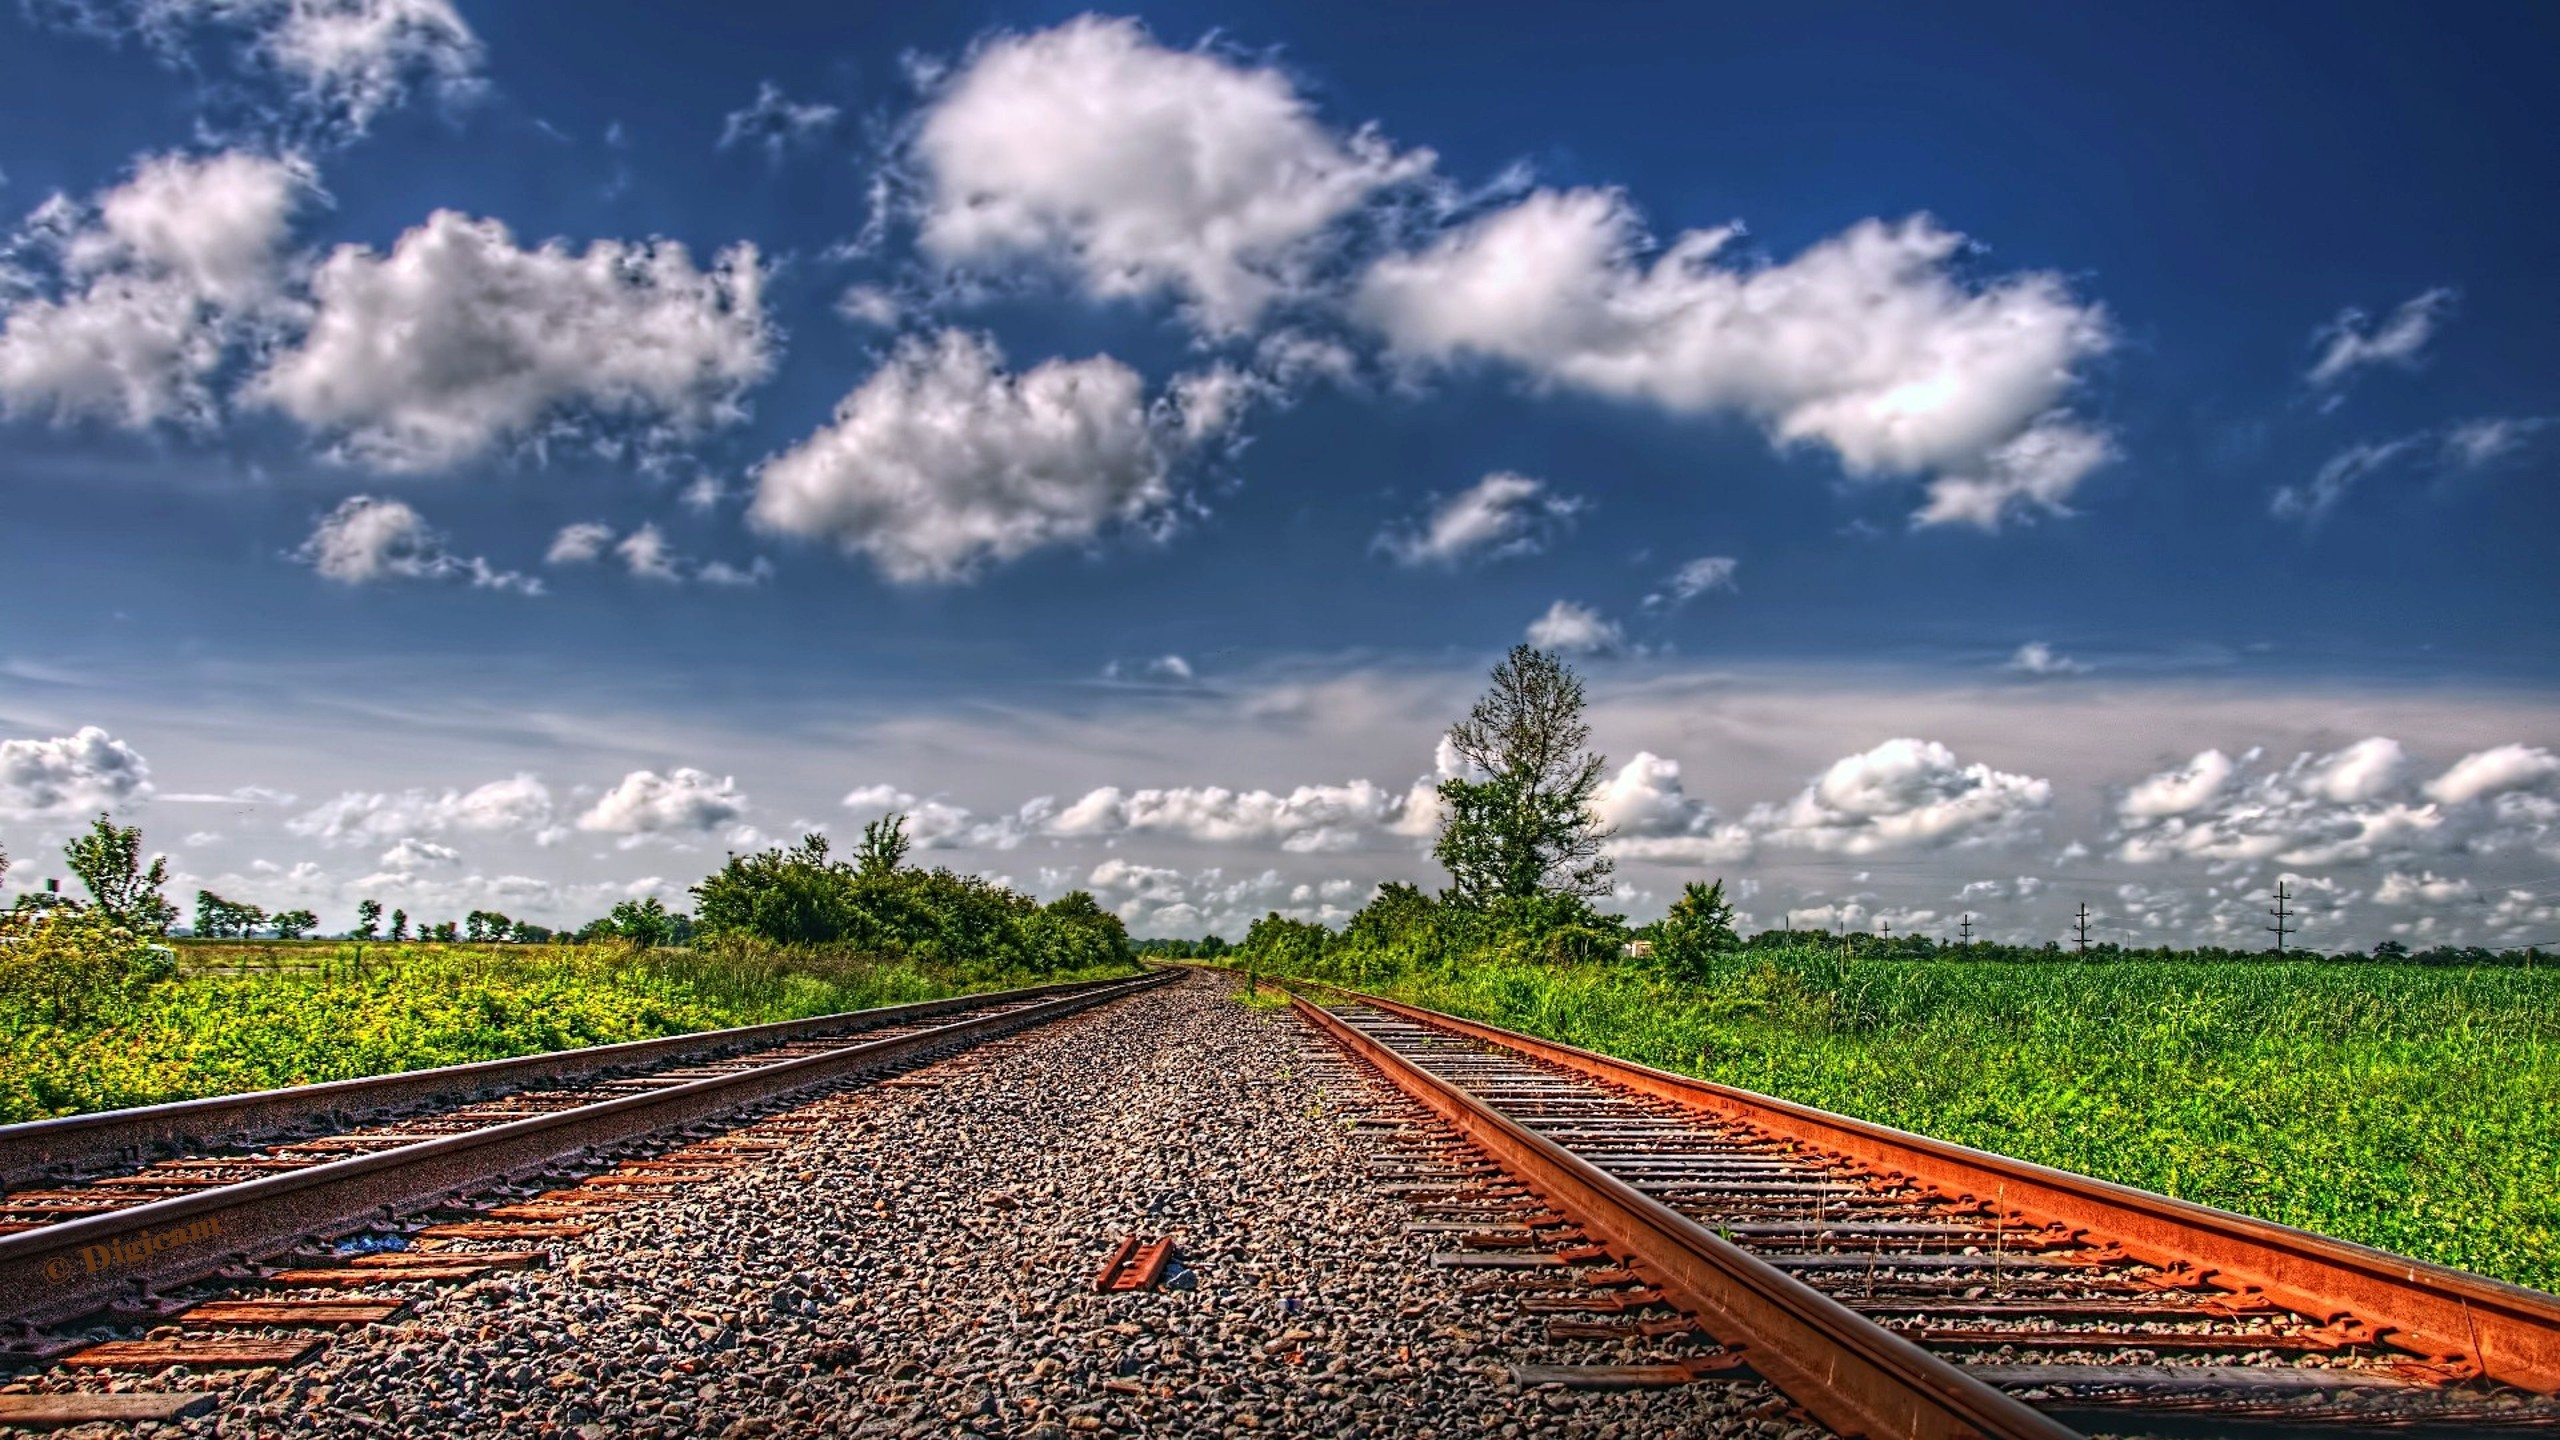 Landscape railway Computer Wallpapers, Desktop Backgrounds ...